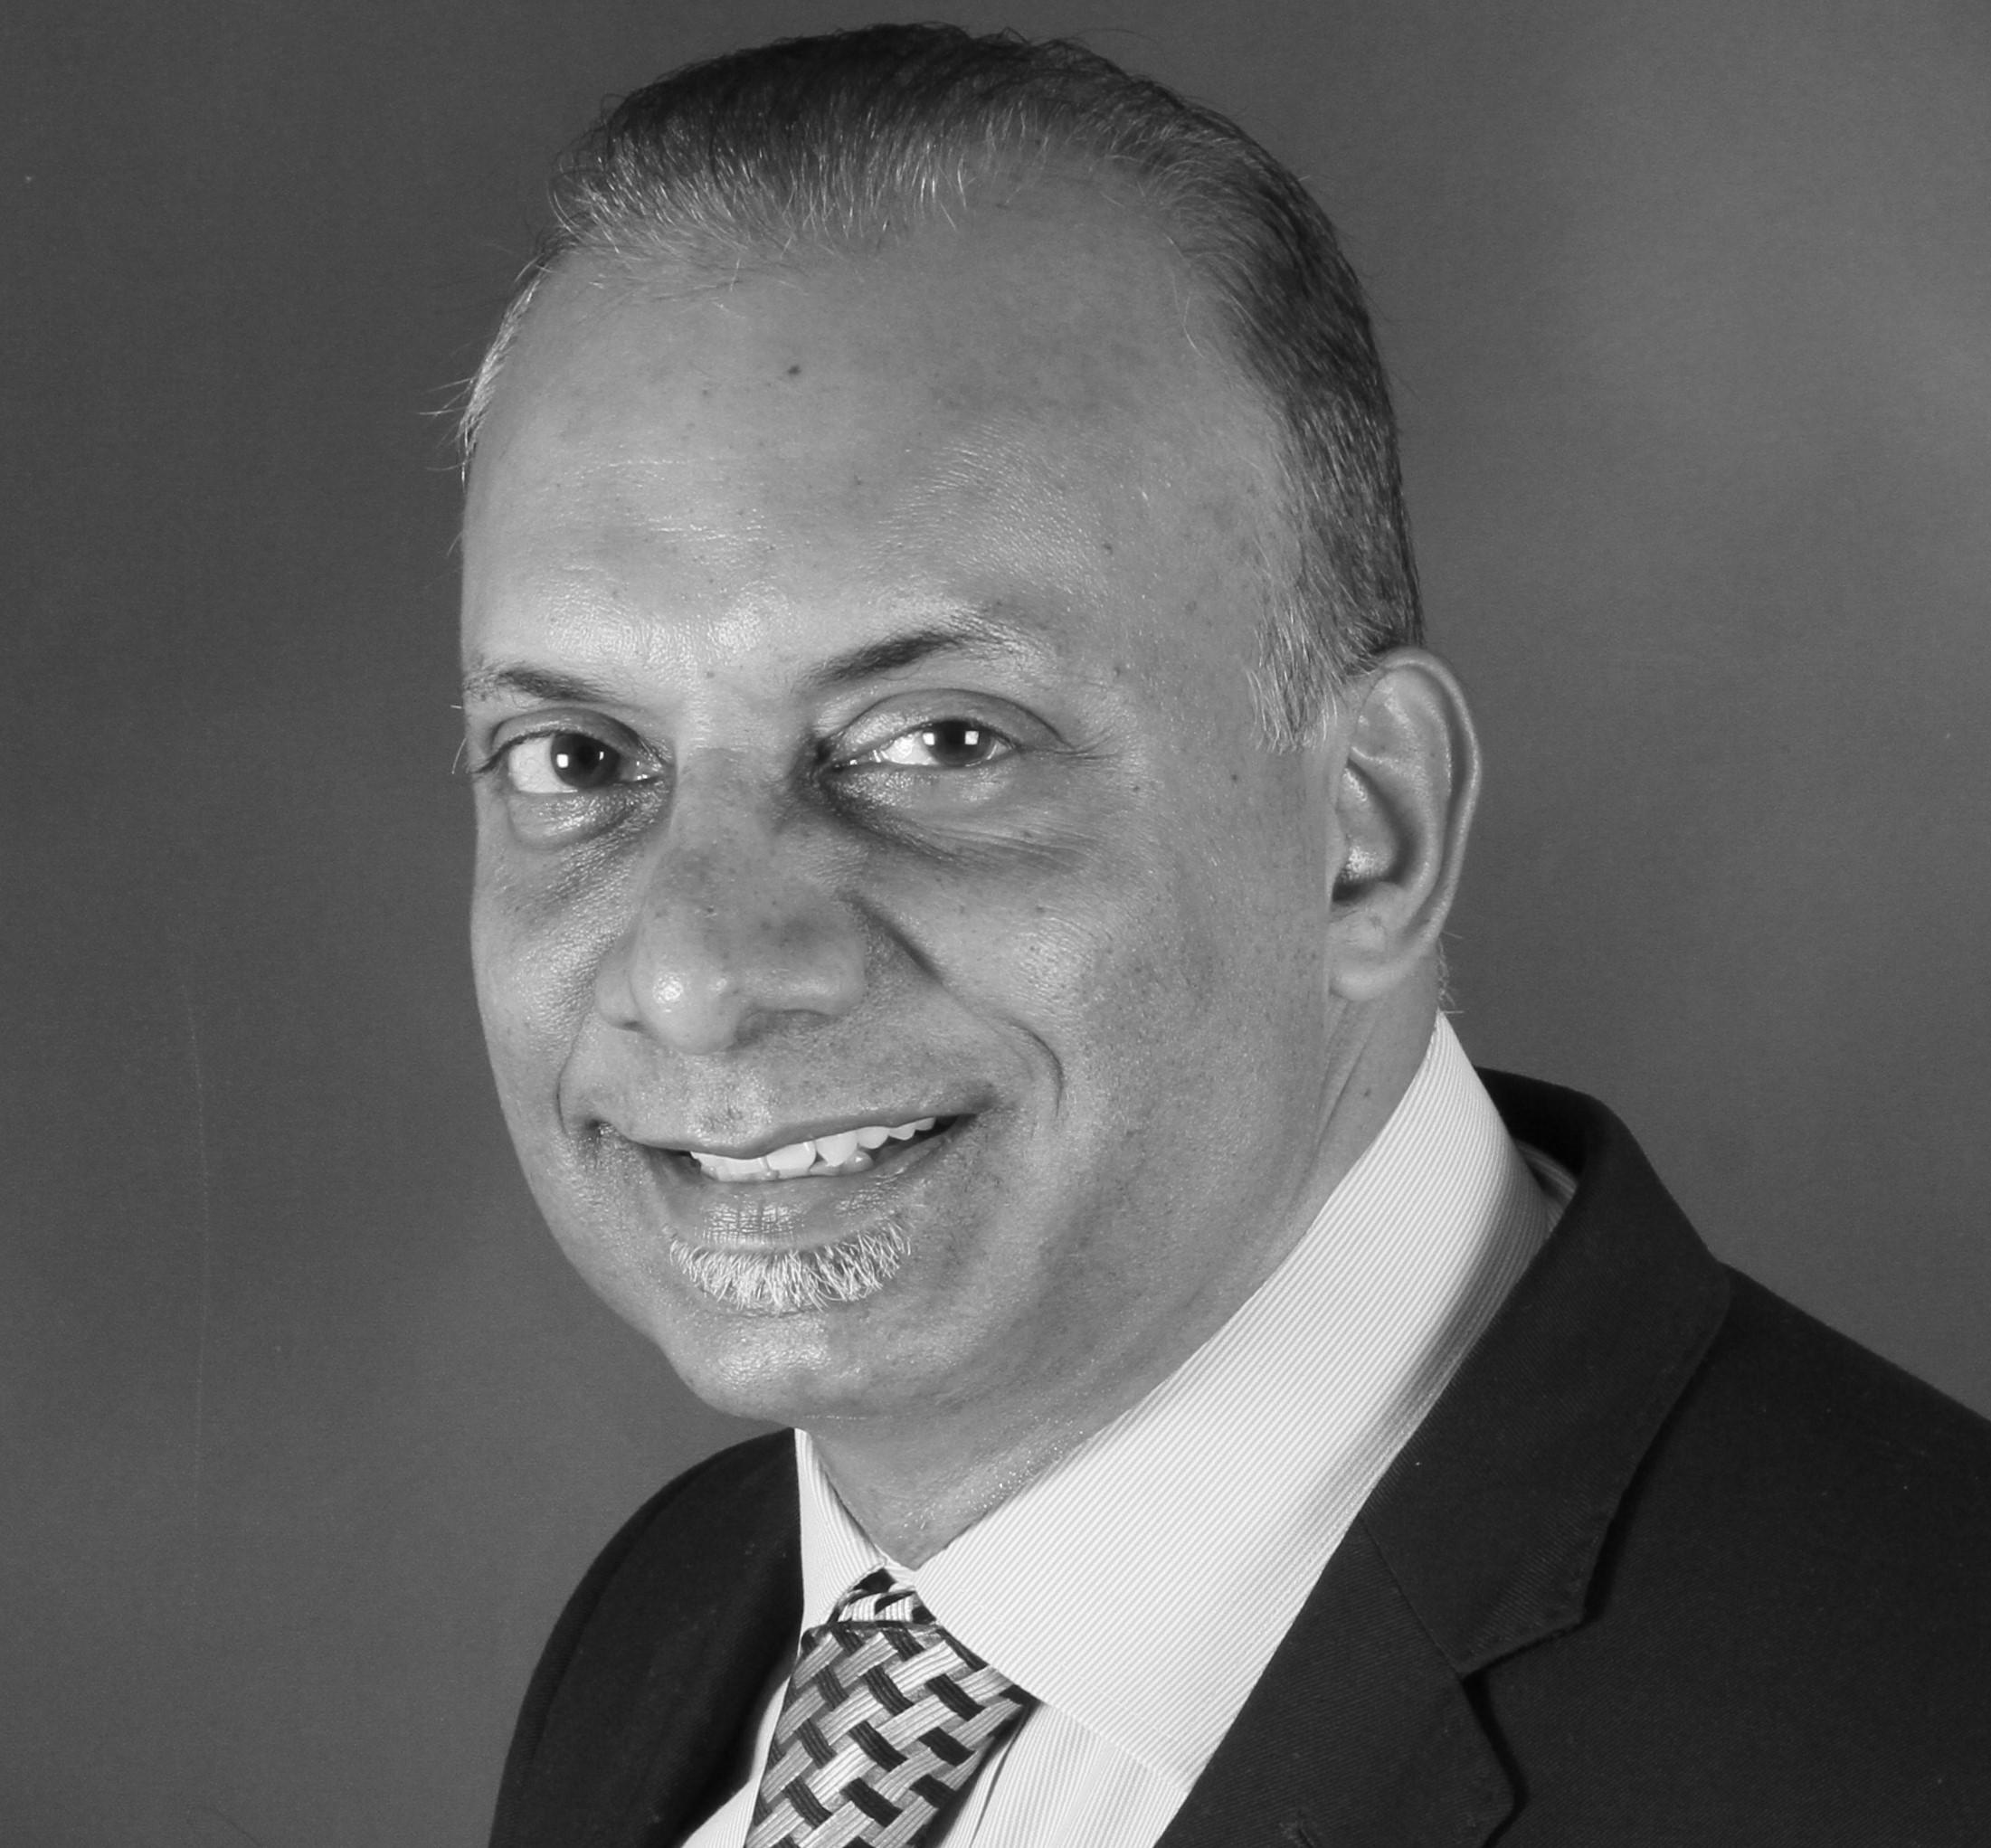 Deepak Misra joins RealFoundations Chennai as General Manager.